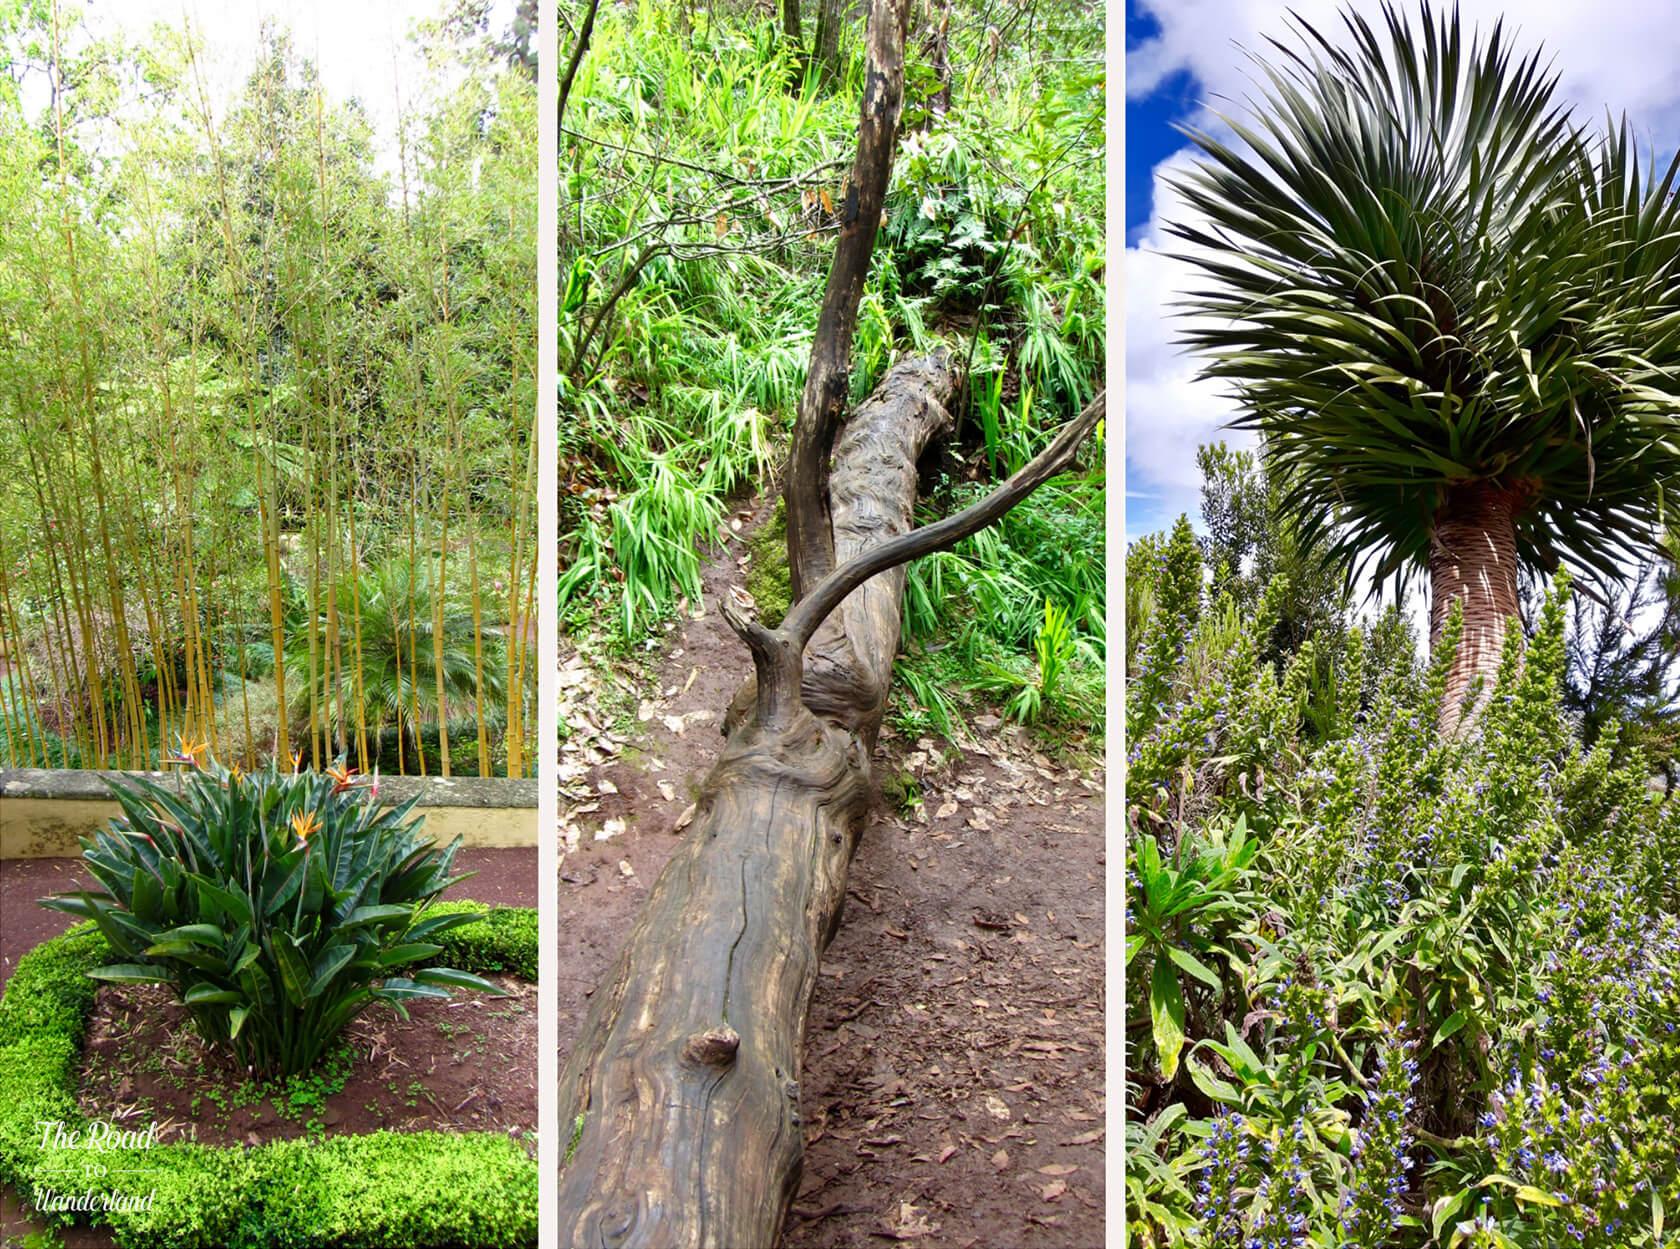 Trees & plants at the Finca de Osorio